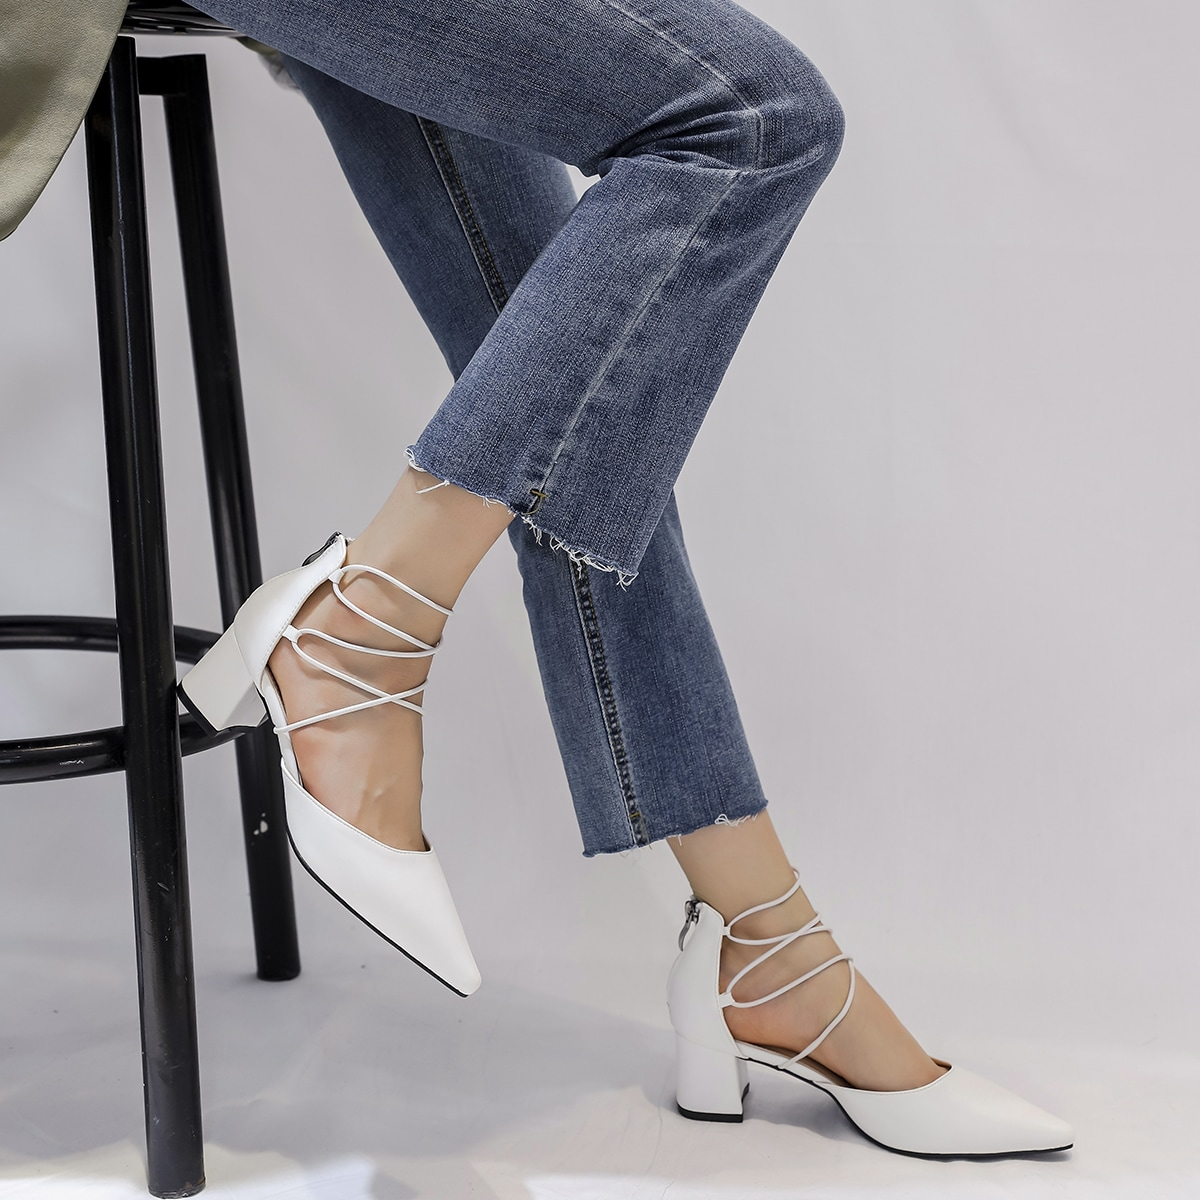 Минималистские туфли на среднем каблуке